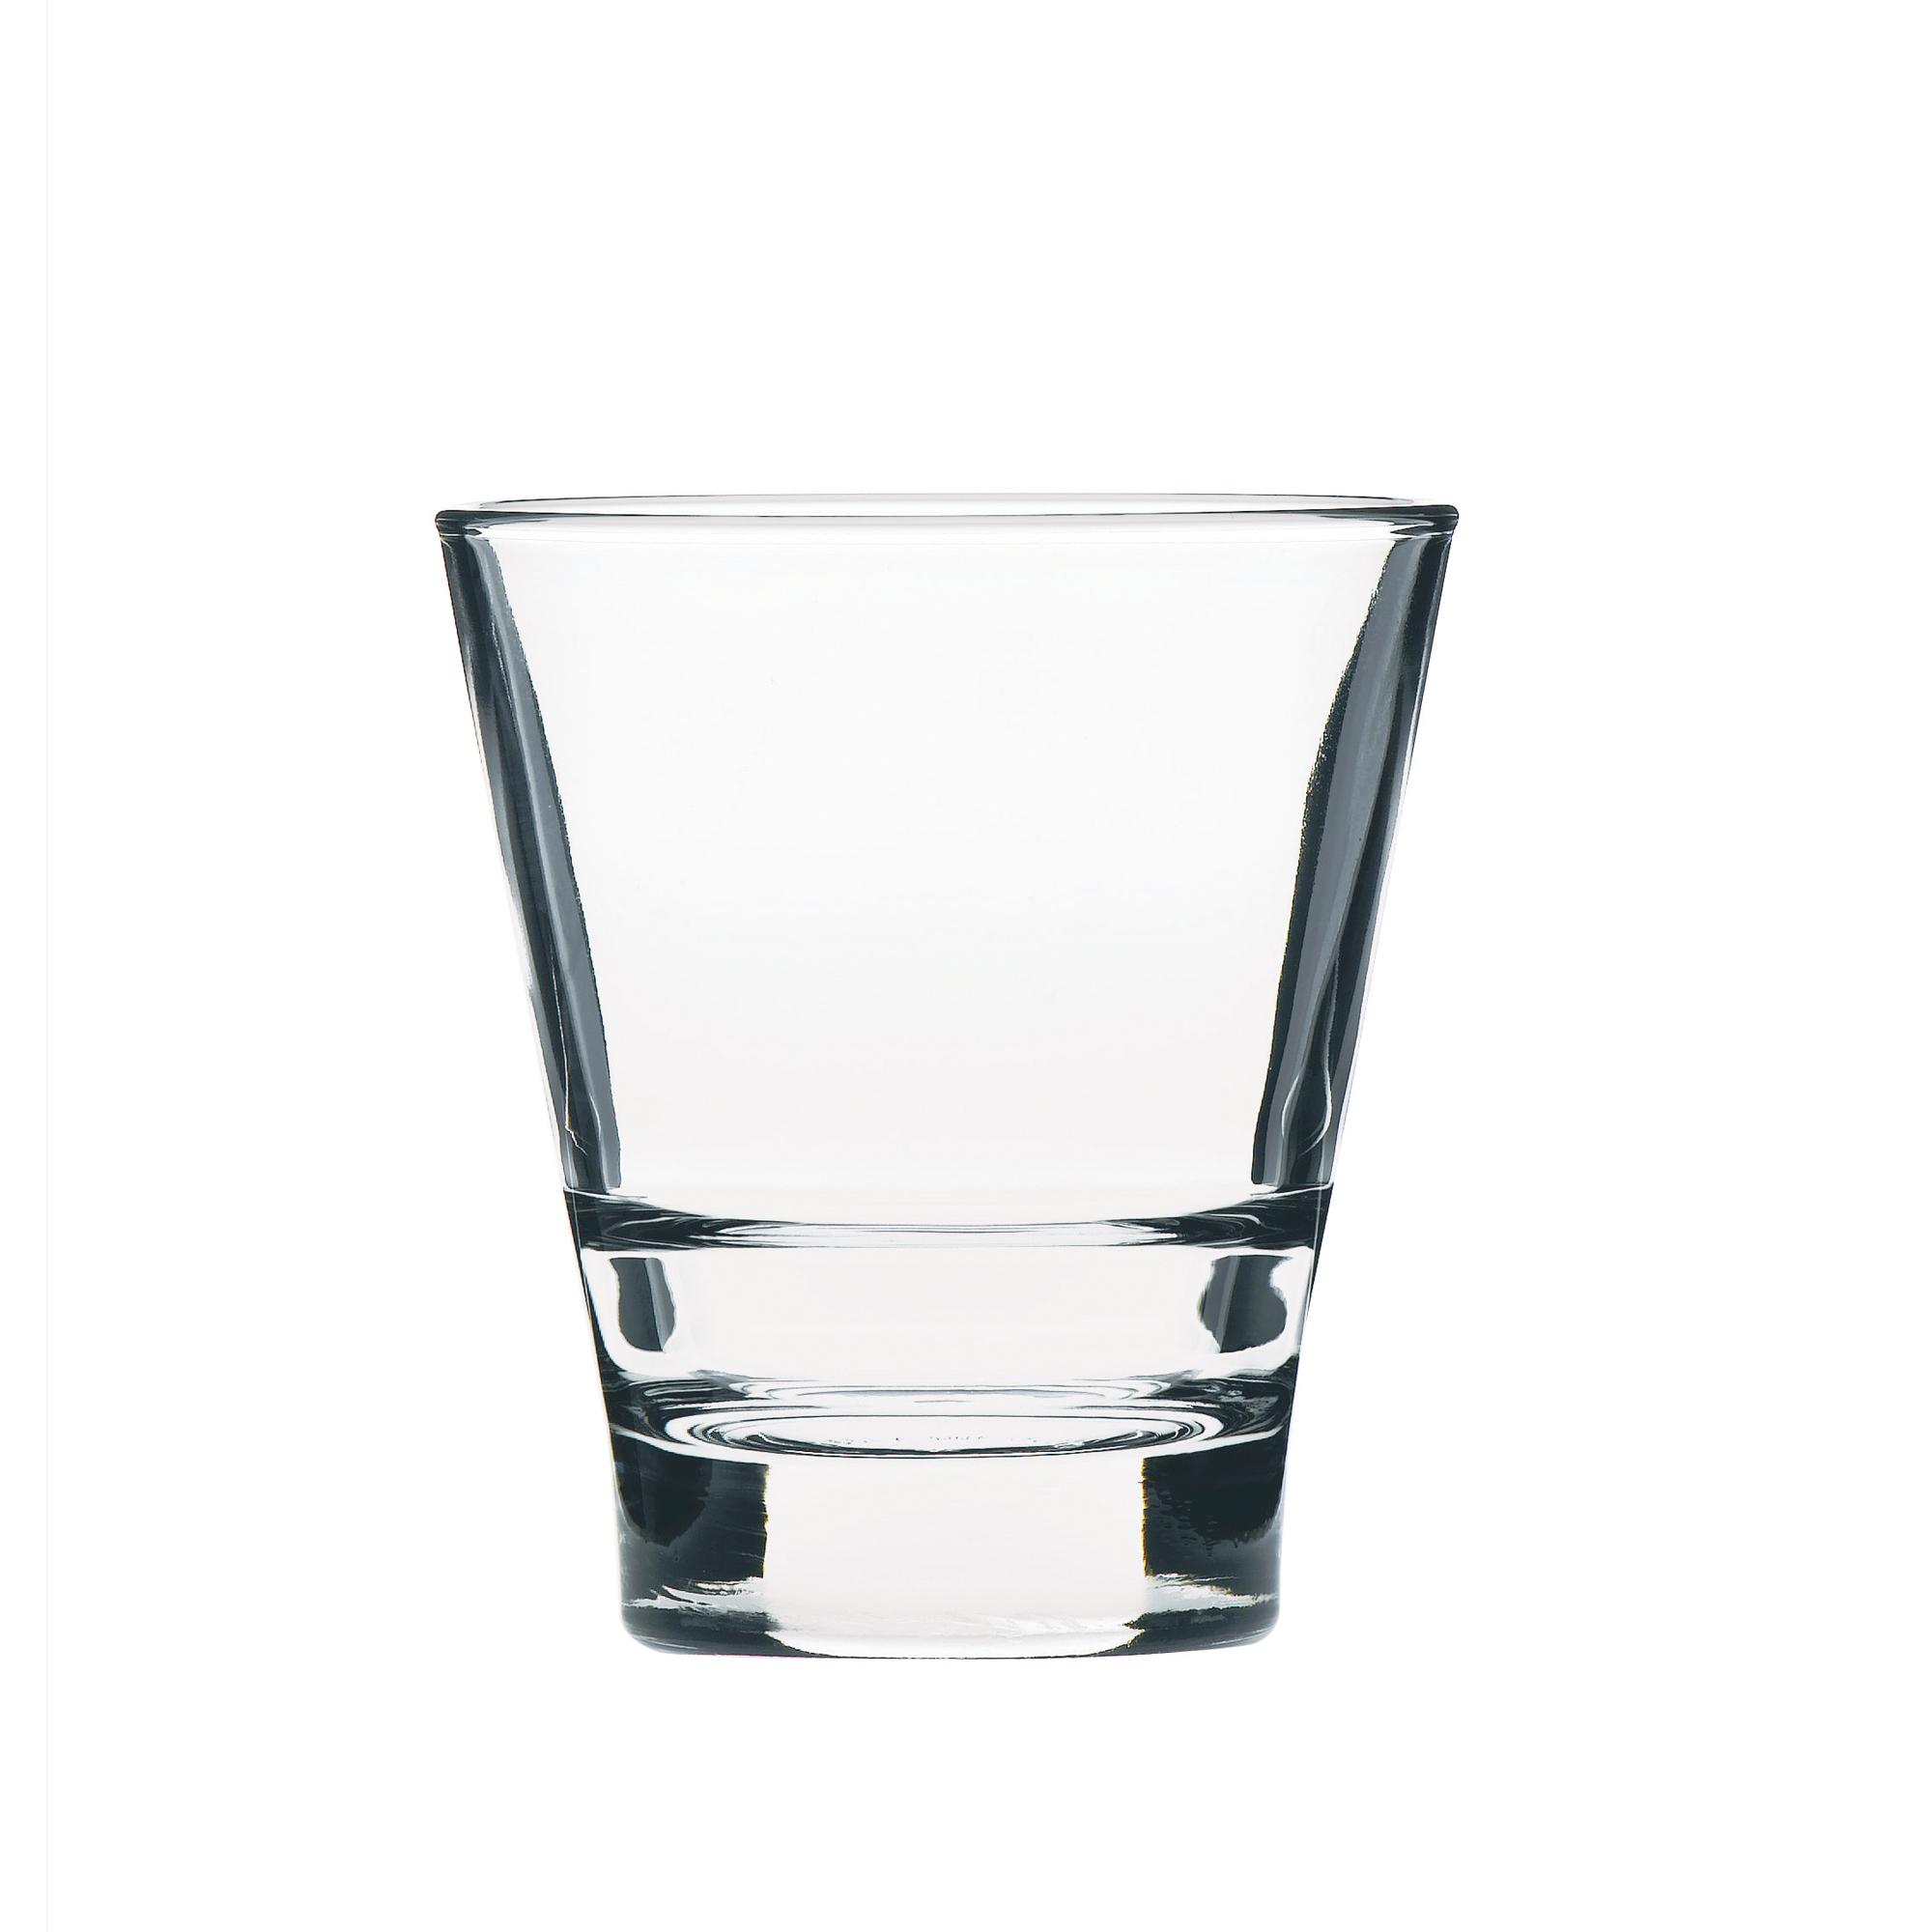 ff11292f784 ... Old Fashioned Tumbler Glasses · Artis On sale · Endeavor Rocks Tumblers  9oz   260ml